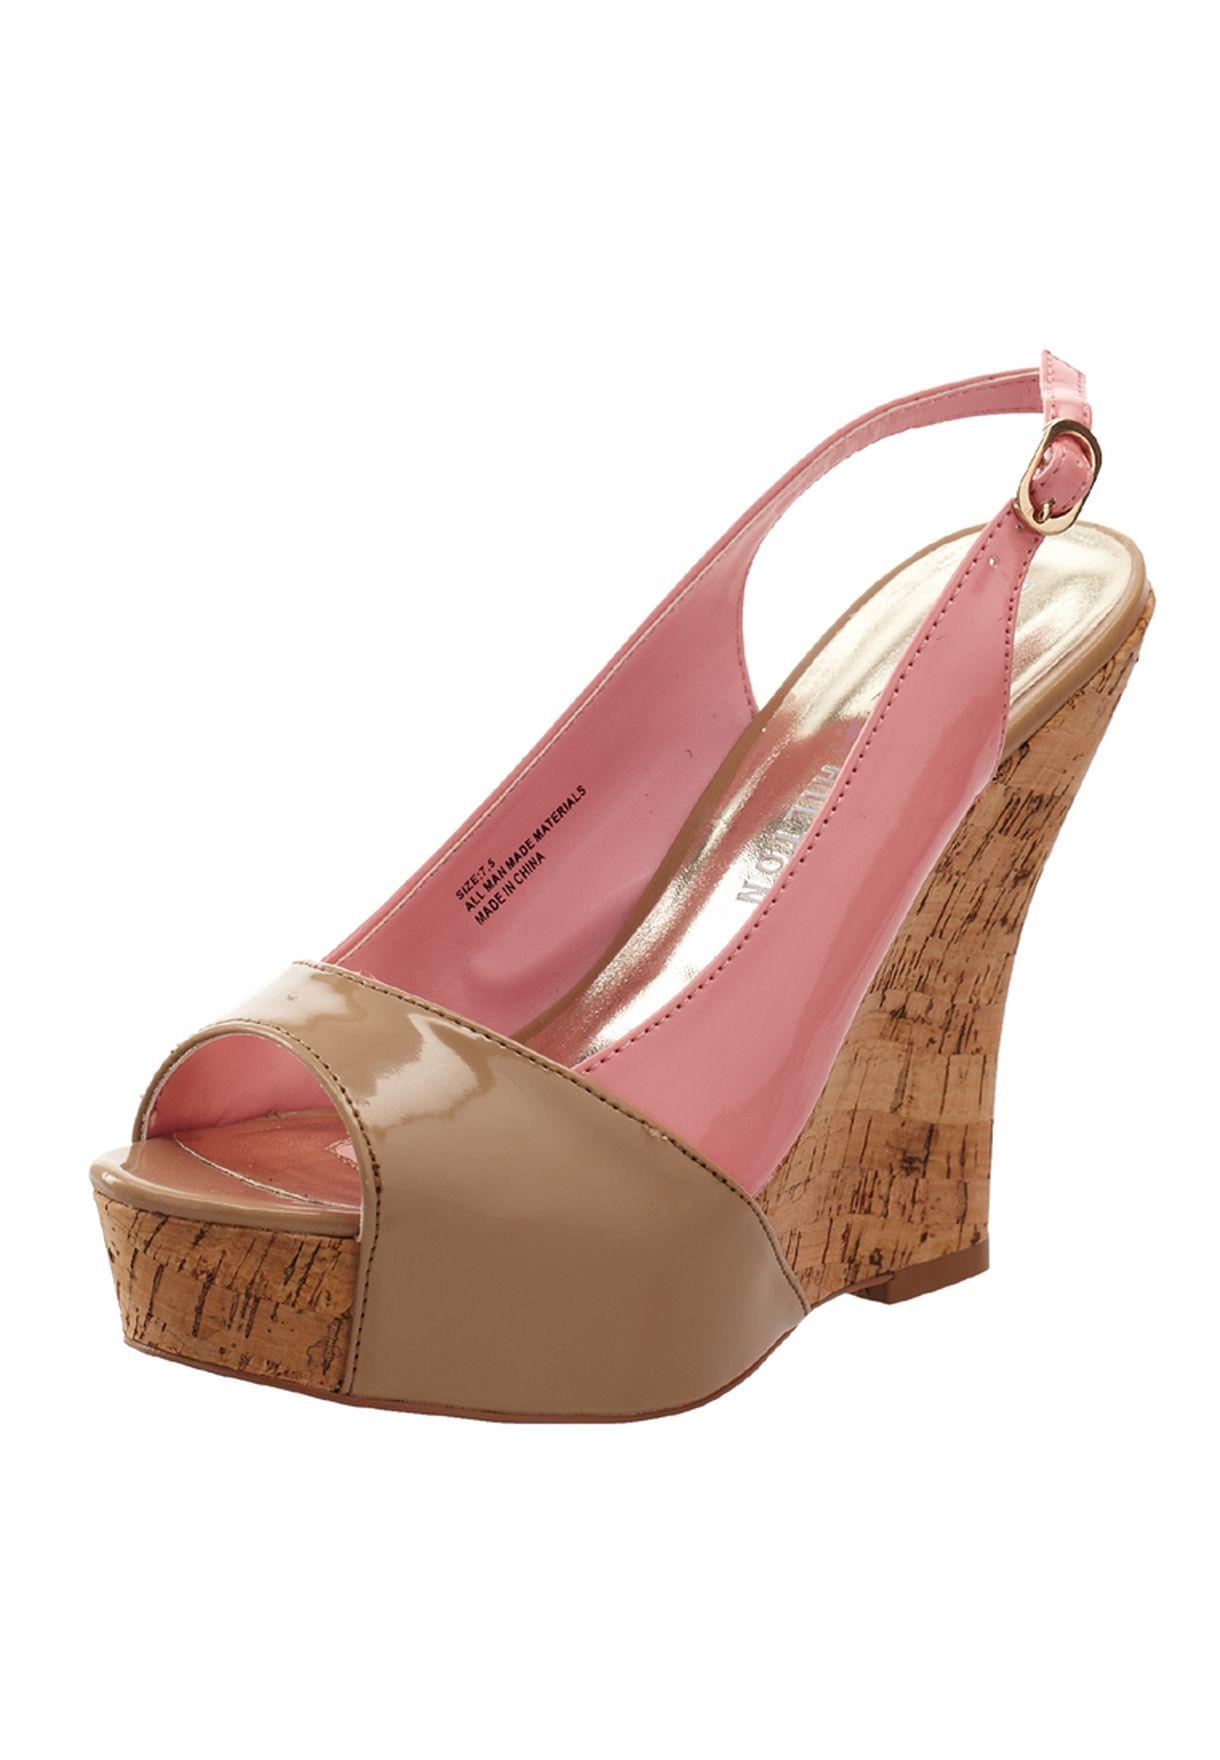 2b2792eeaa80c1 Shop Paris hilton pink Alaya Wedge Sandals for Women in Saudi ...